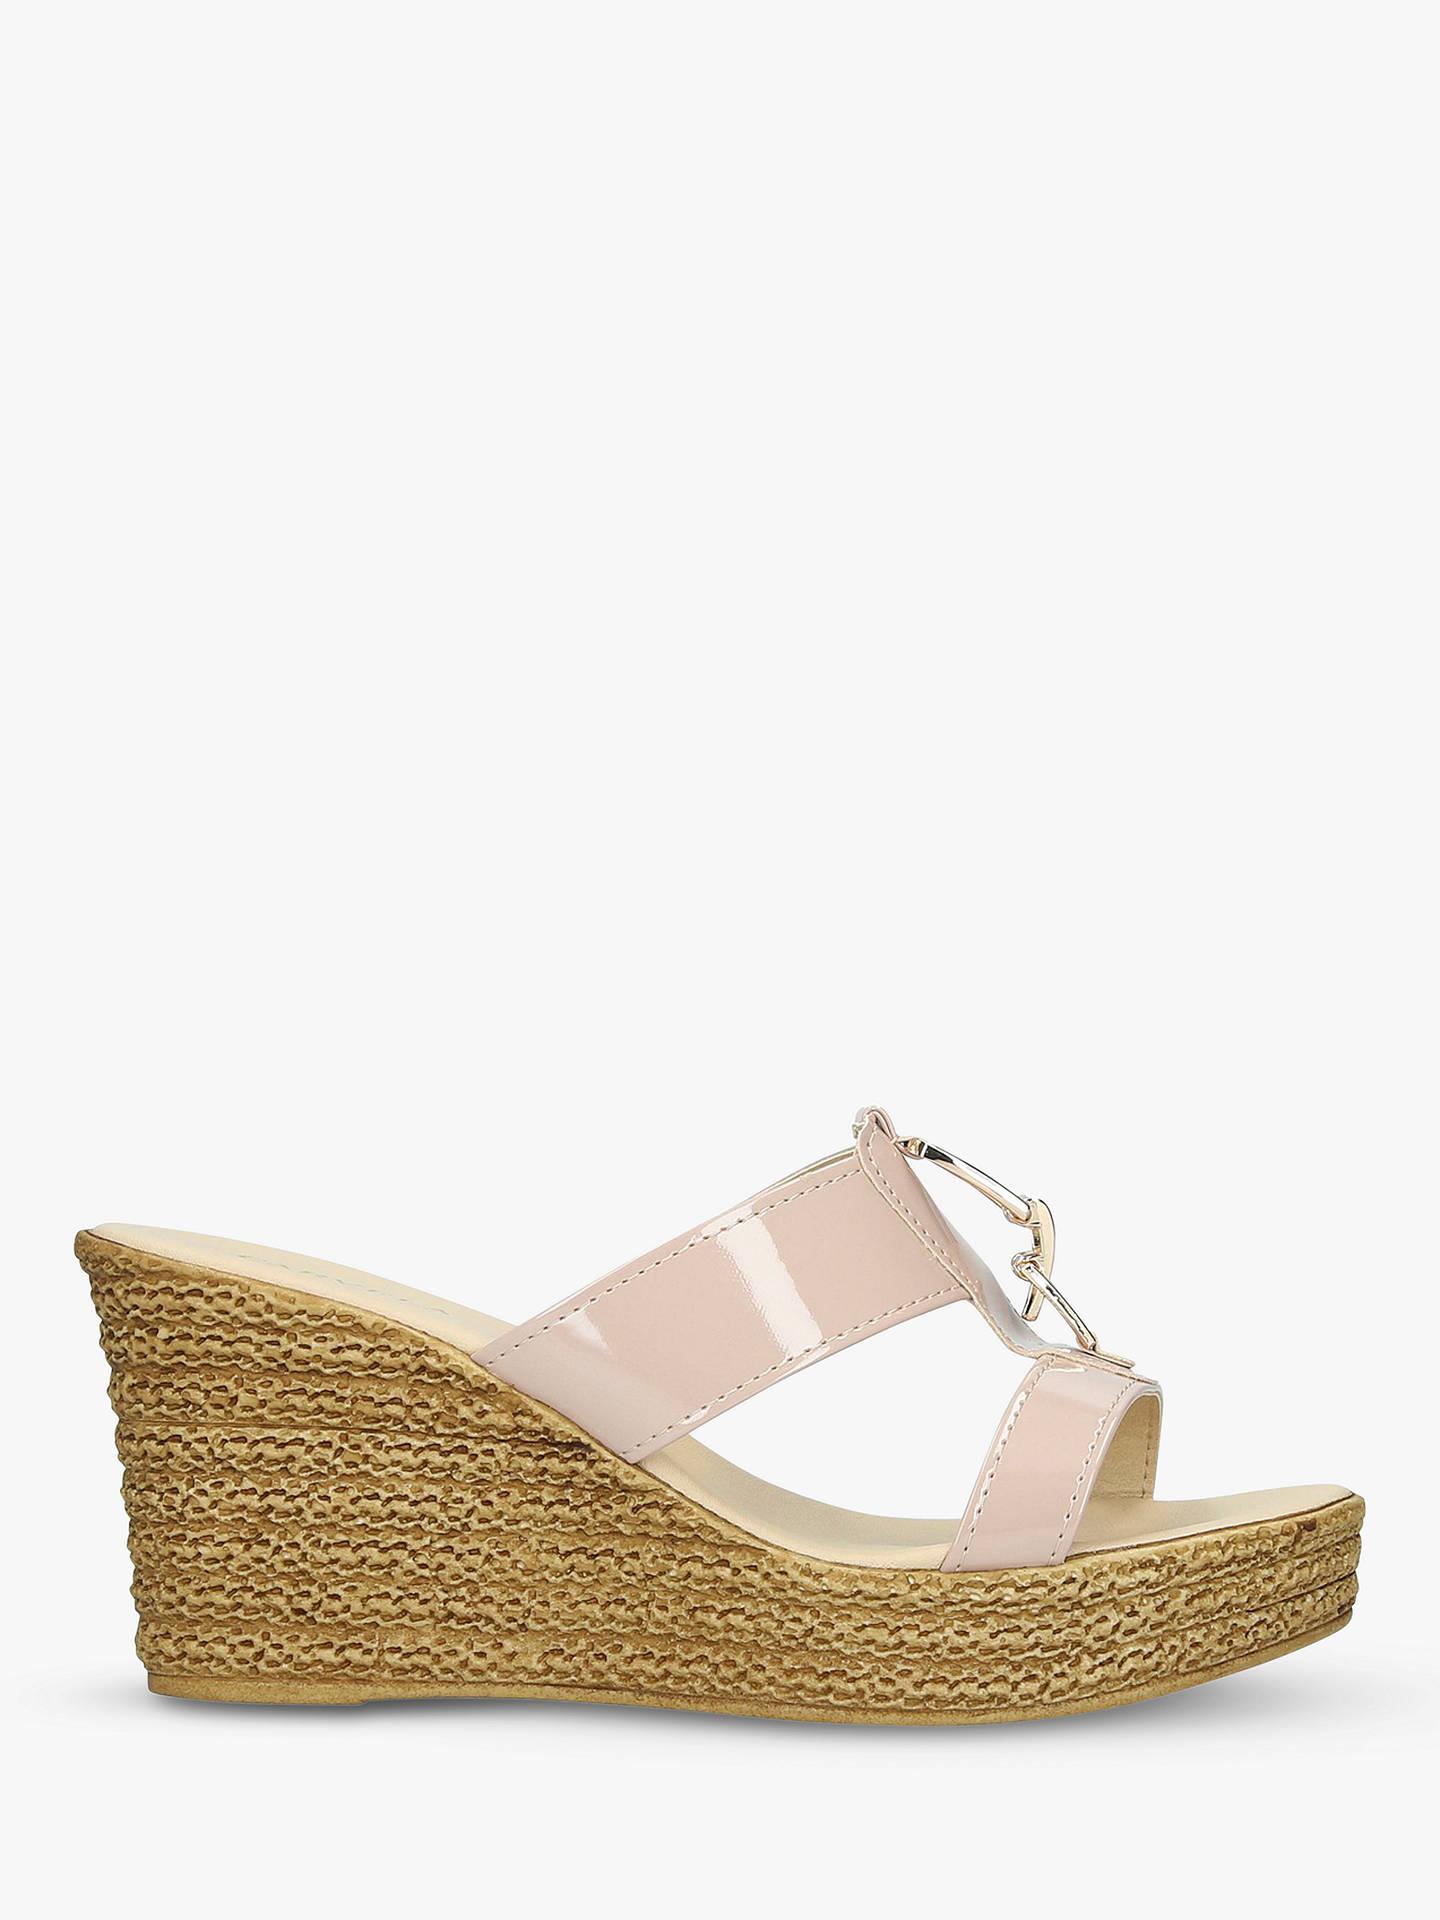 3fb76f0e74aa Buy Carvela Comfort Stevie Wedge Heel Sandals